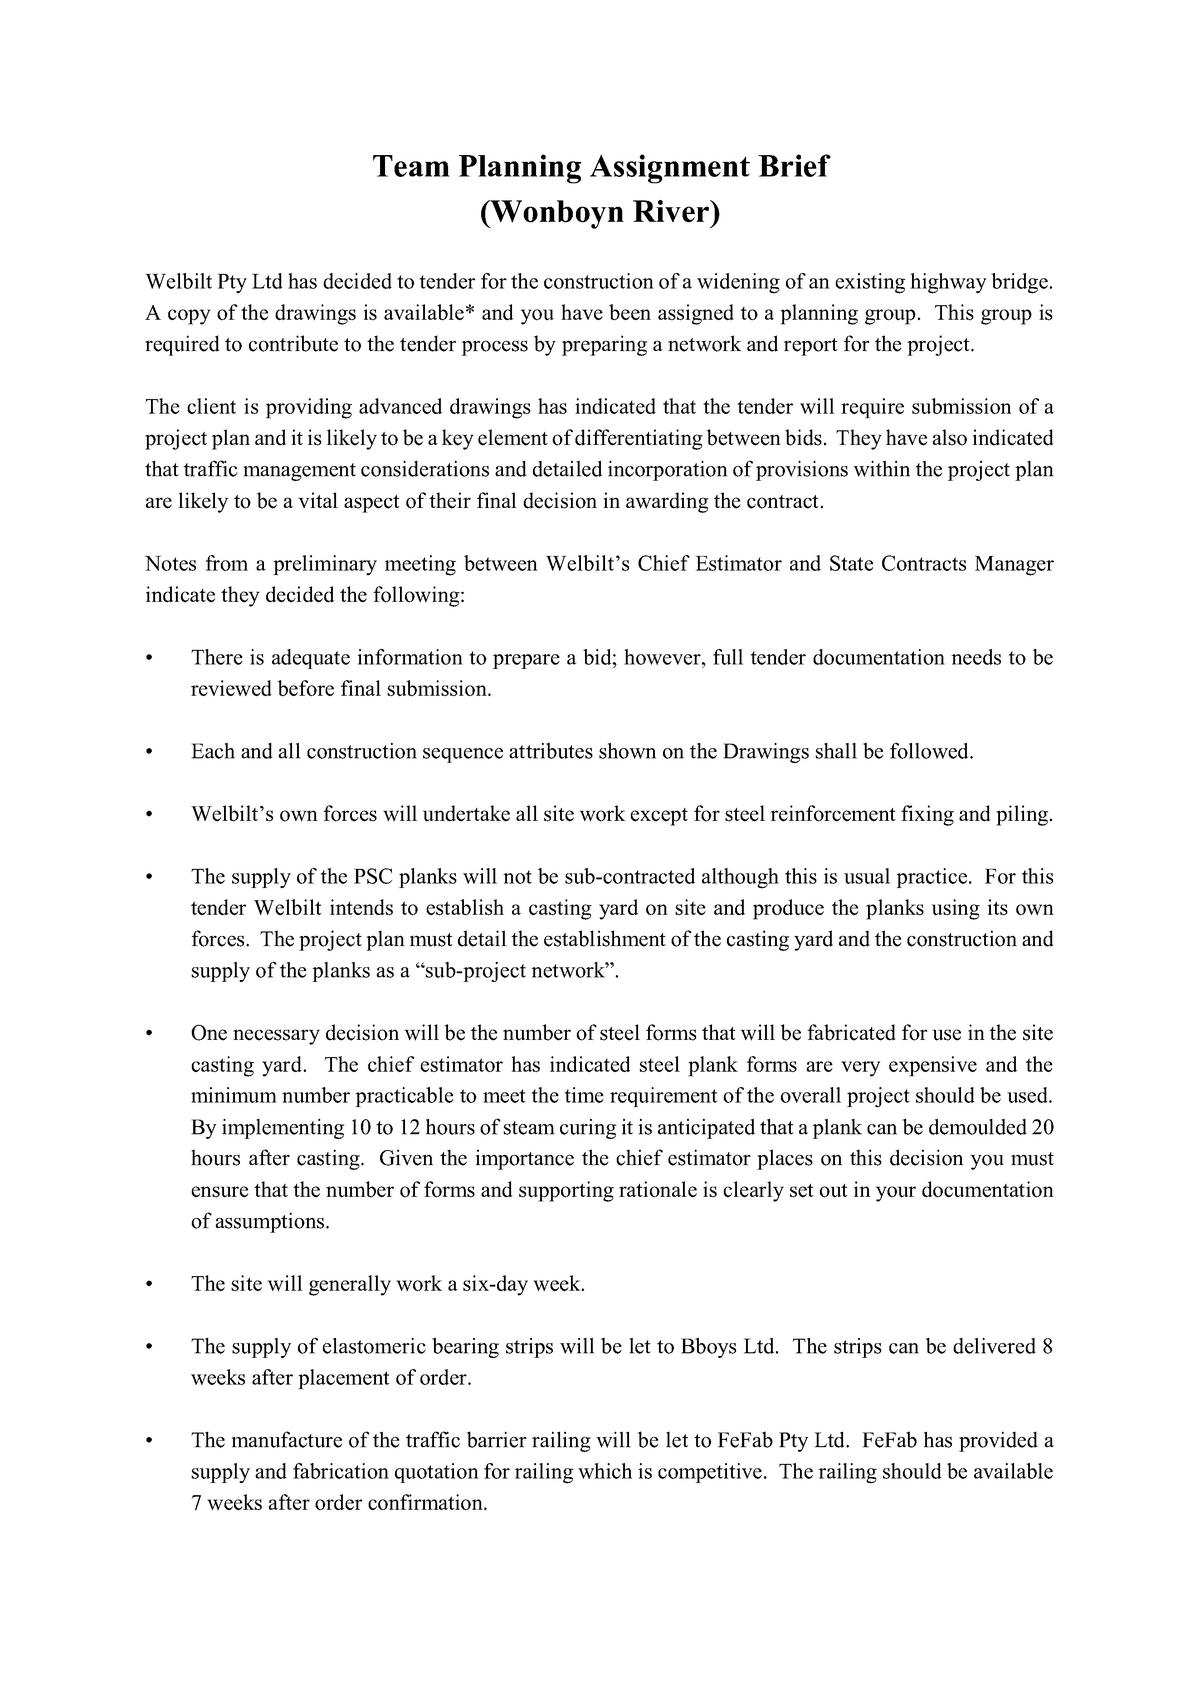 Team Planning Assignment Brief - 048340 : Construction - StuDocu